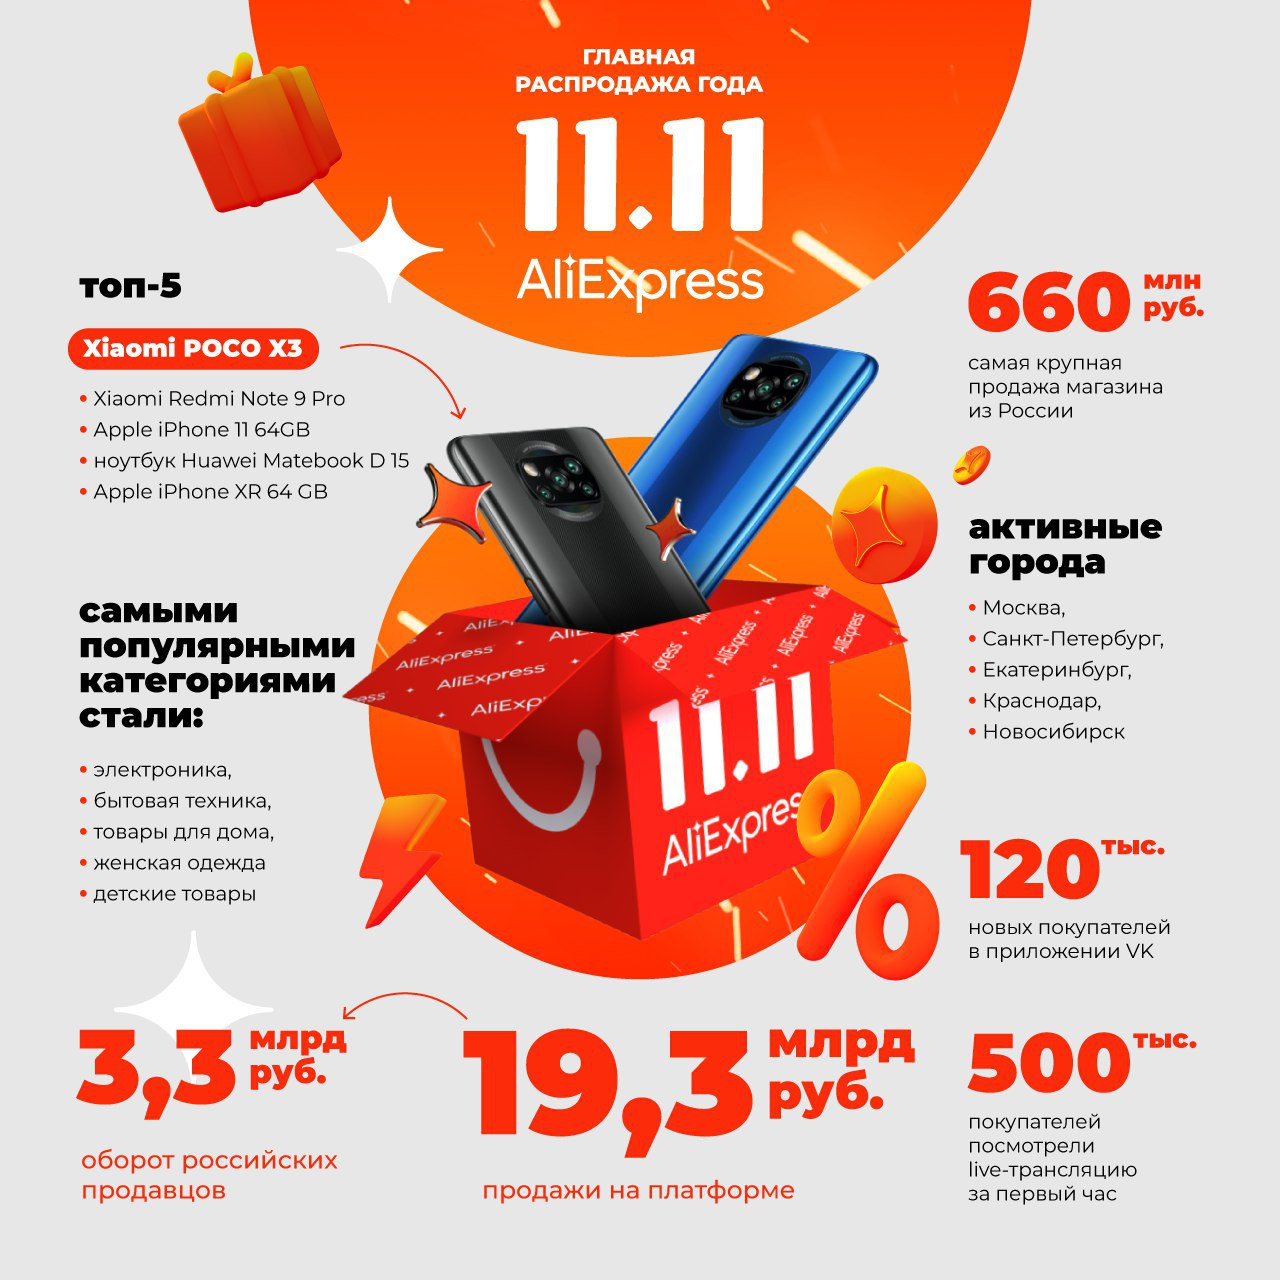 За время распродажи 11.11 россияне сделали покупки на AliExpress на 19,3 млрд рублей